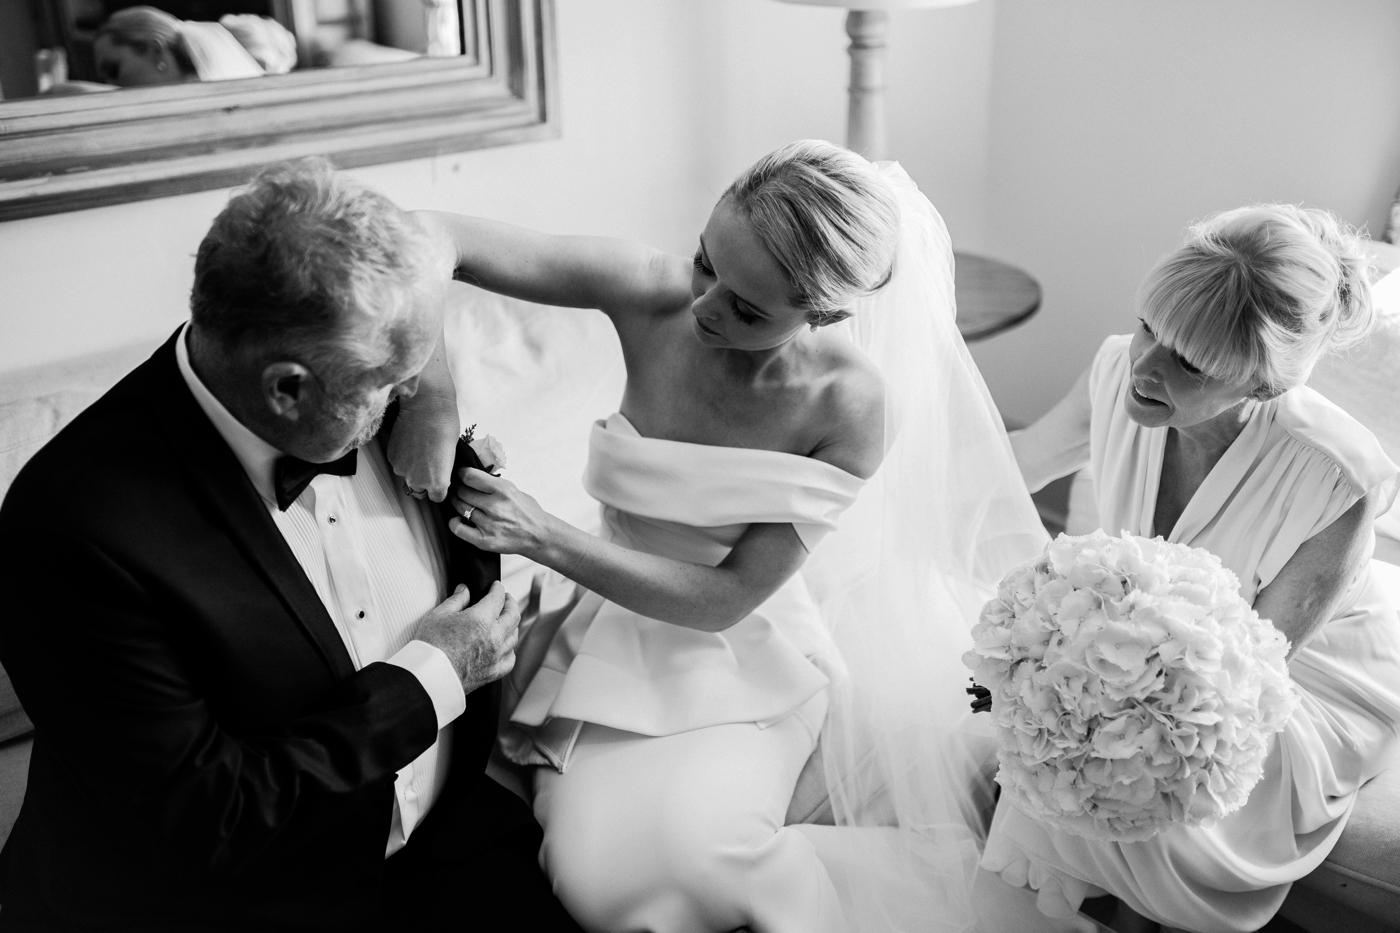 Bec & Brad - Waverley Estate Wedding - Natural Wedding Photographer in Adelaide - www.katherineschultzphotography.com 16